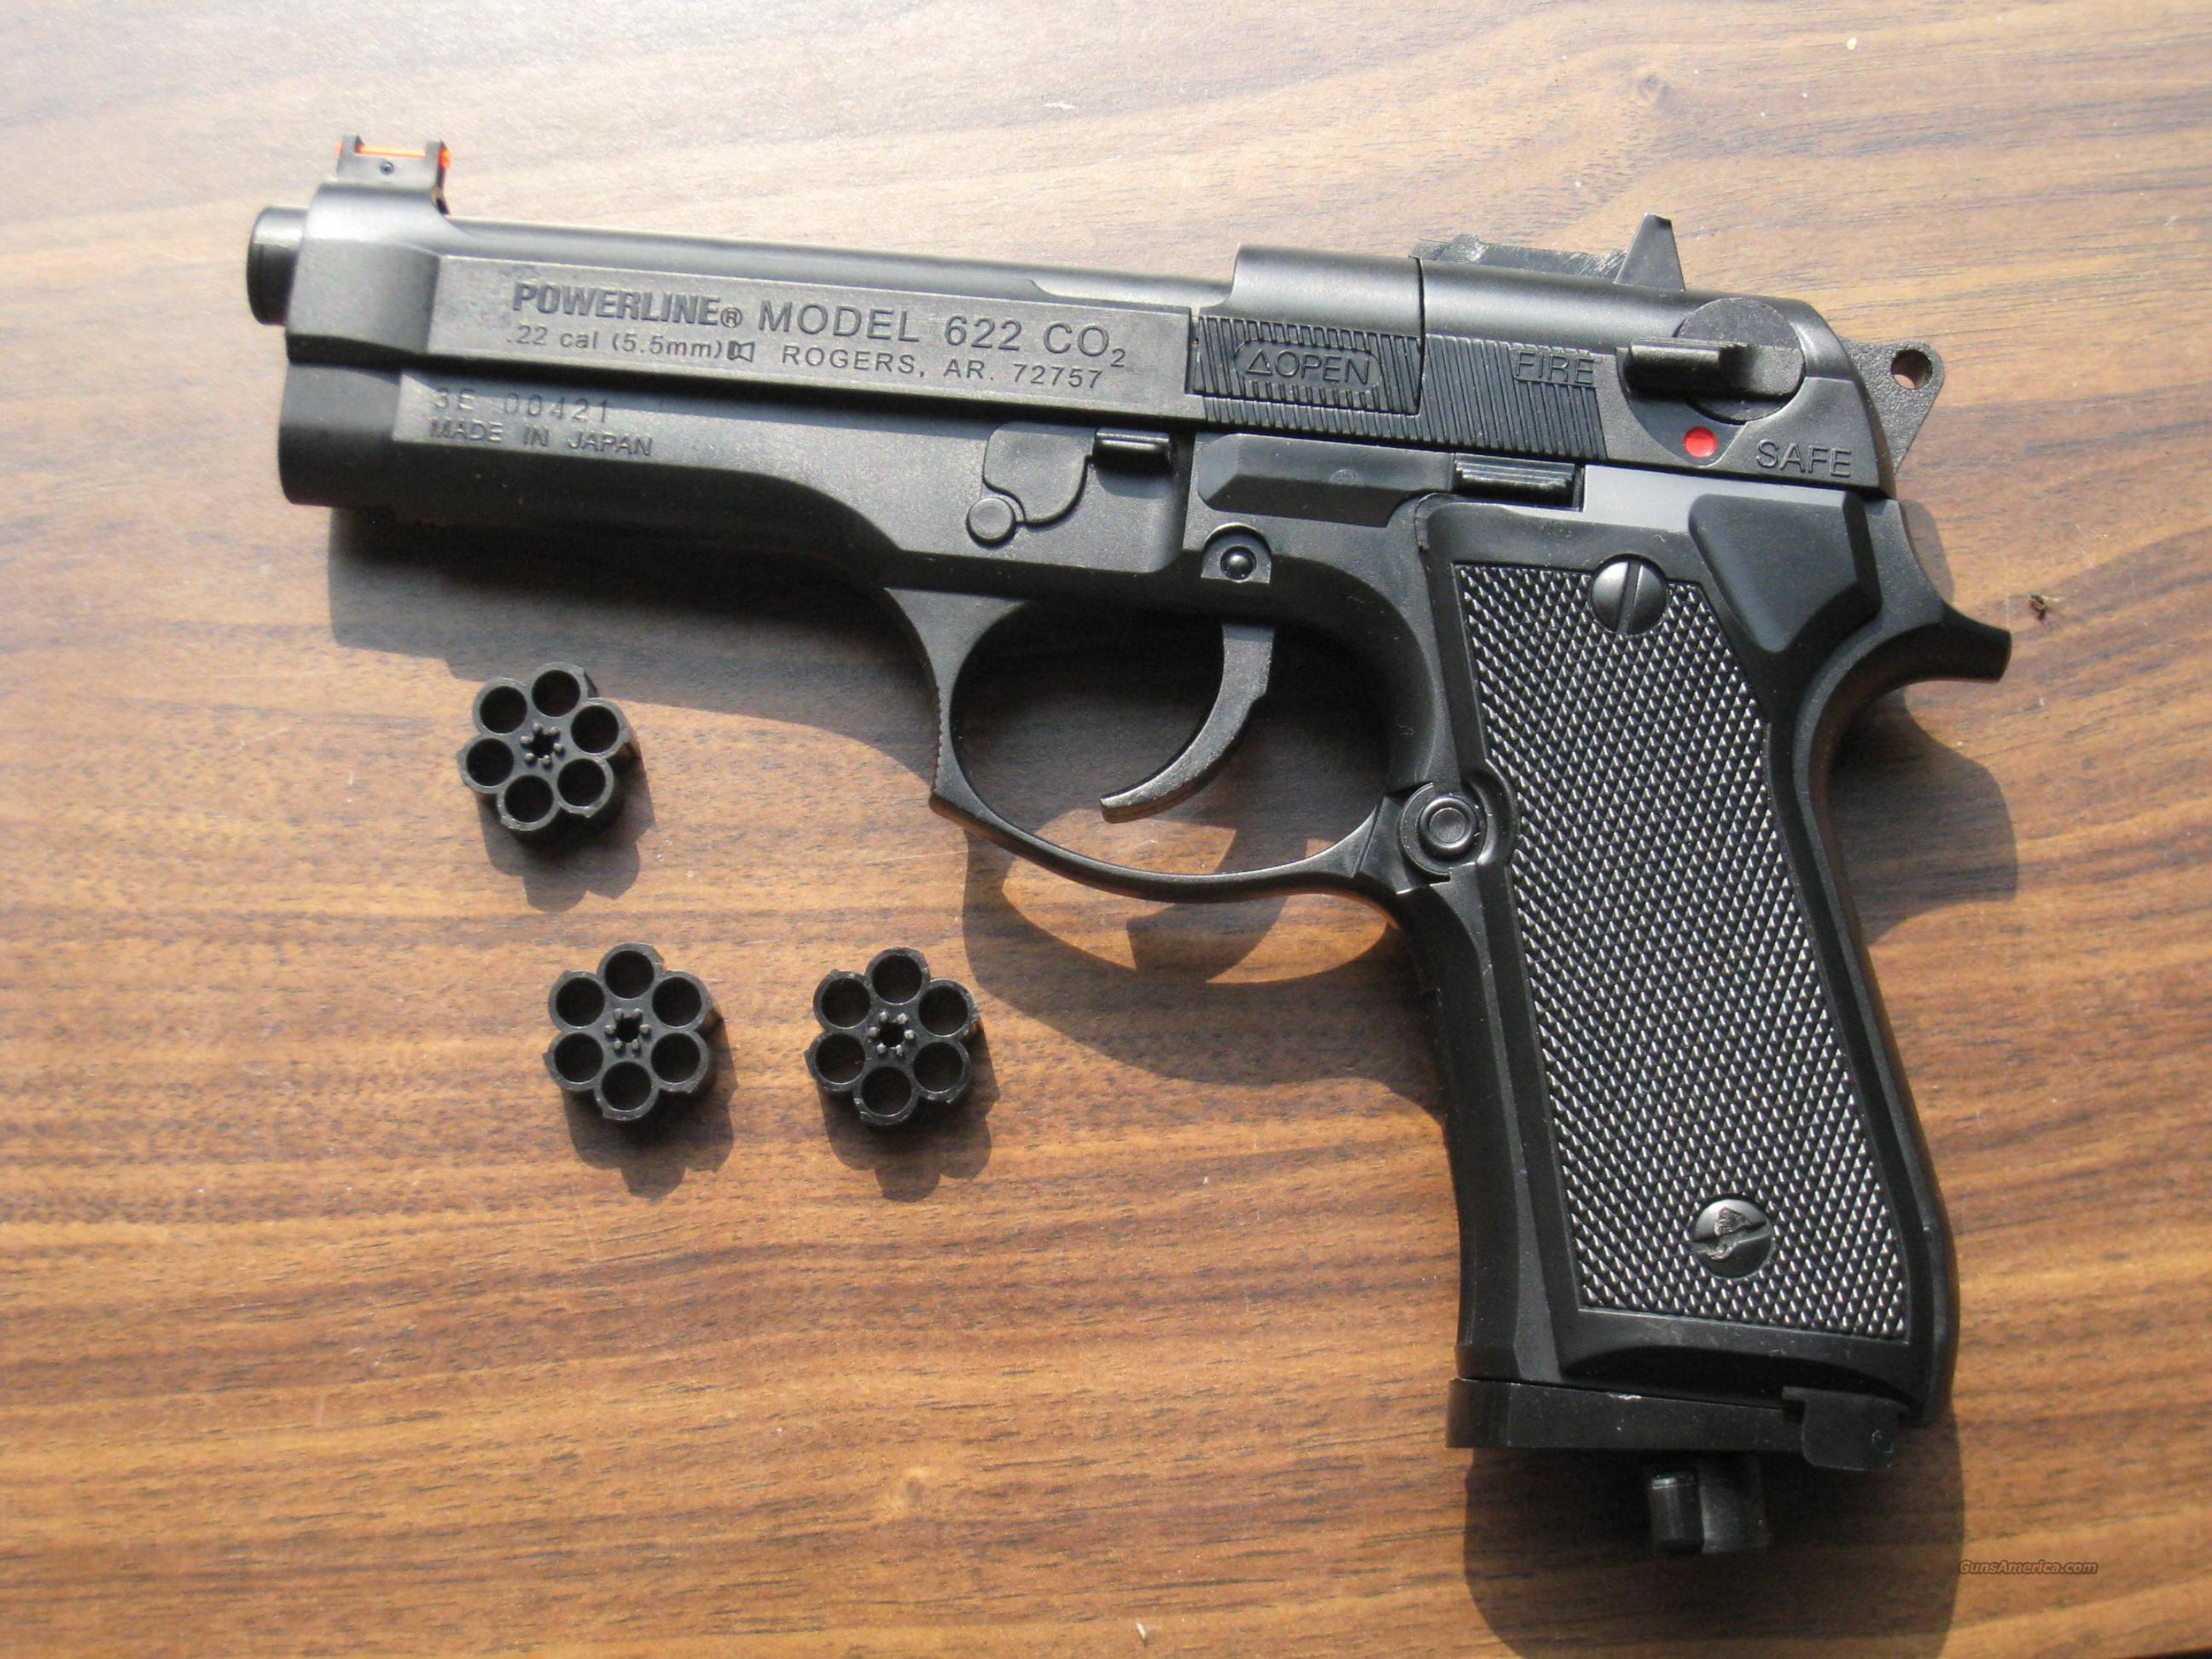 daisy powerline 622x a co2 repeater pistol with for sale rh gunsamerica com Daisy Powerline 1000 Manual Daisy Powerline 880 Repair Manual